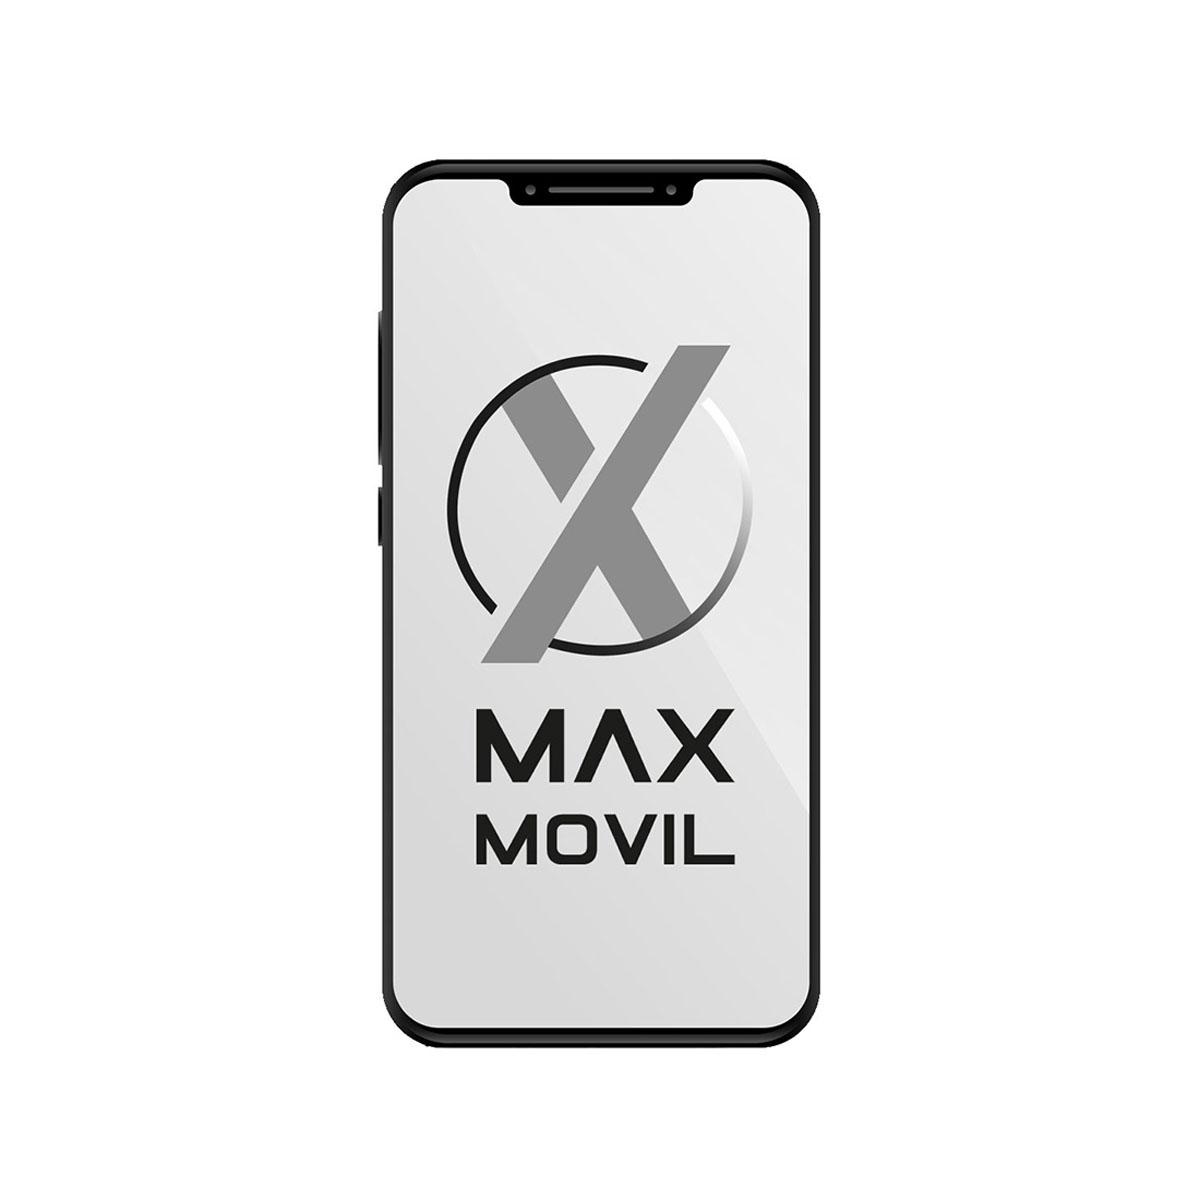 KIT portatil Innjoo Leapbook A100 dorado + maletin Trust + memoria micro SD 64GB  clase 10